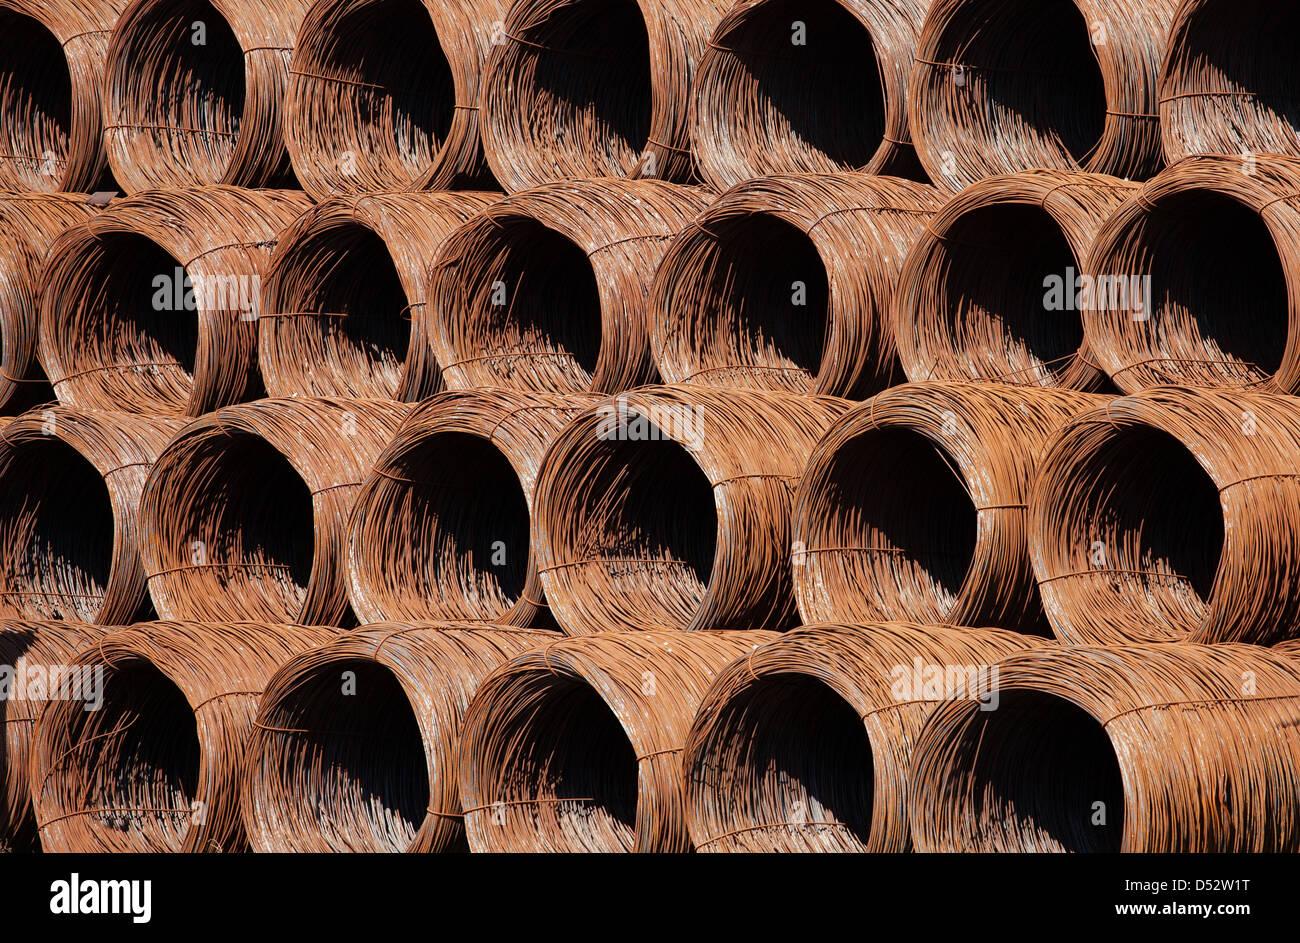 Metal Wire Coils Stockfotos & Metal Wire Coils Bilder - Alamy